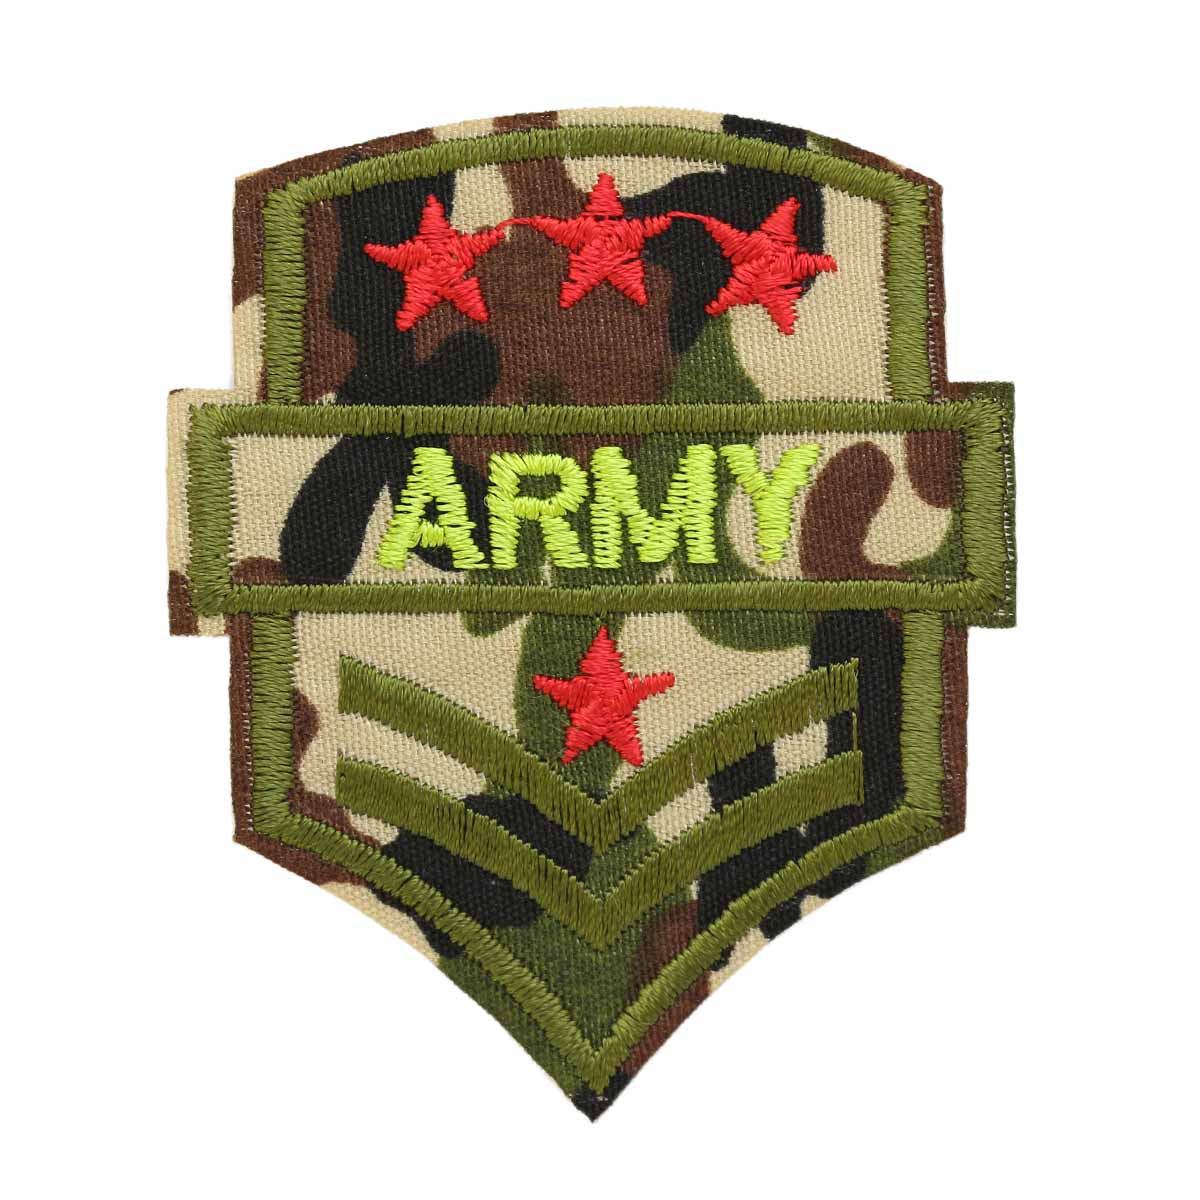 Термоаппликация LM-80288 'Army' 1шт Hobby&Pro basic